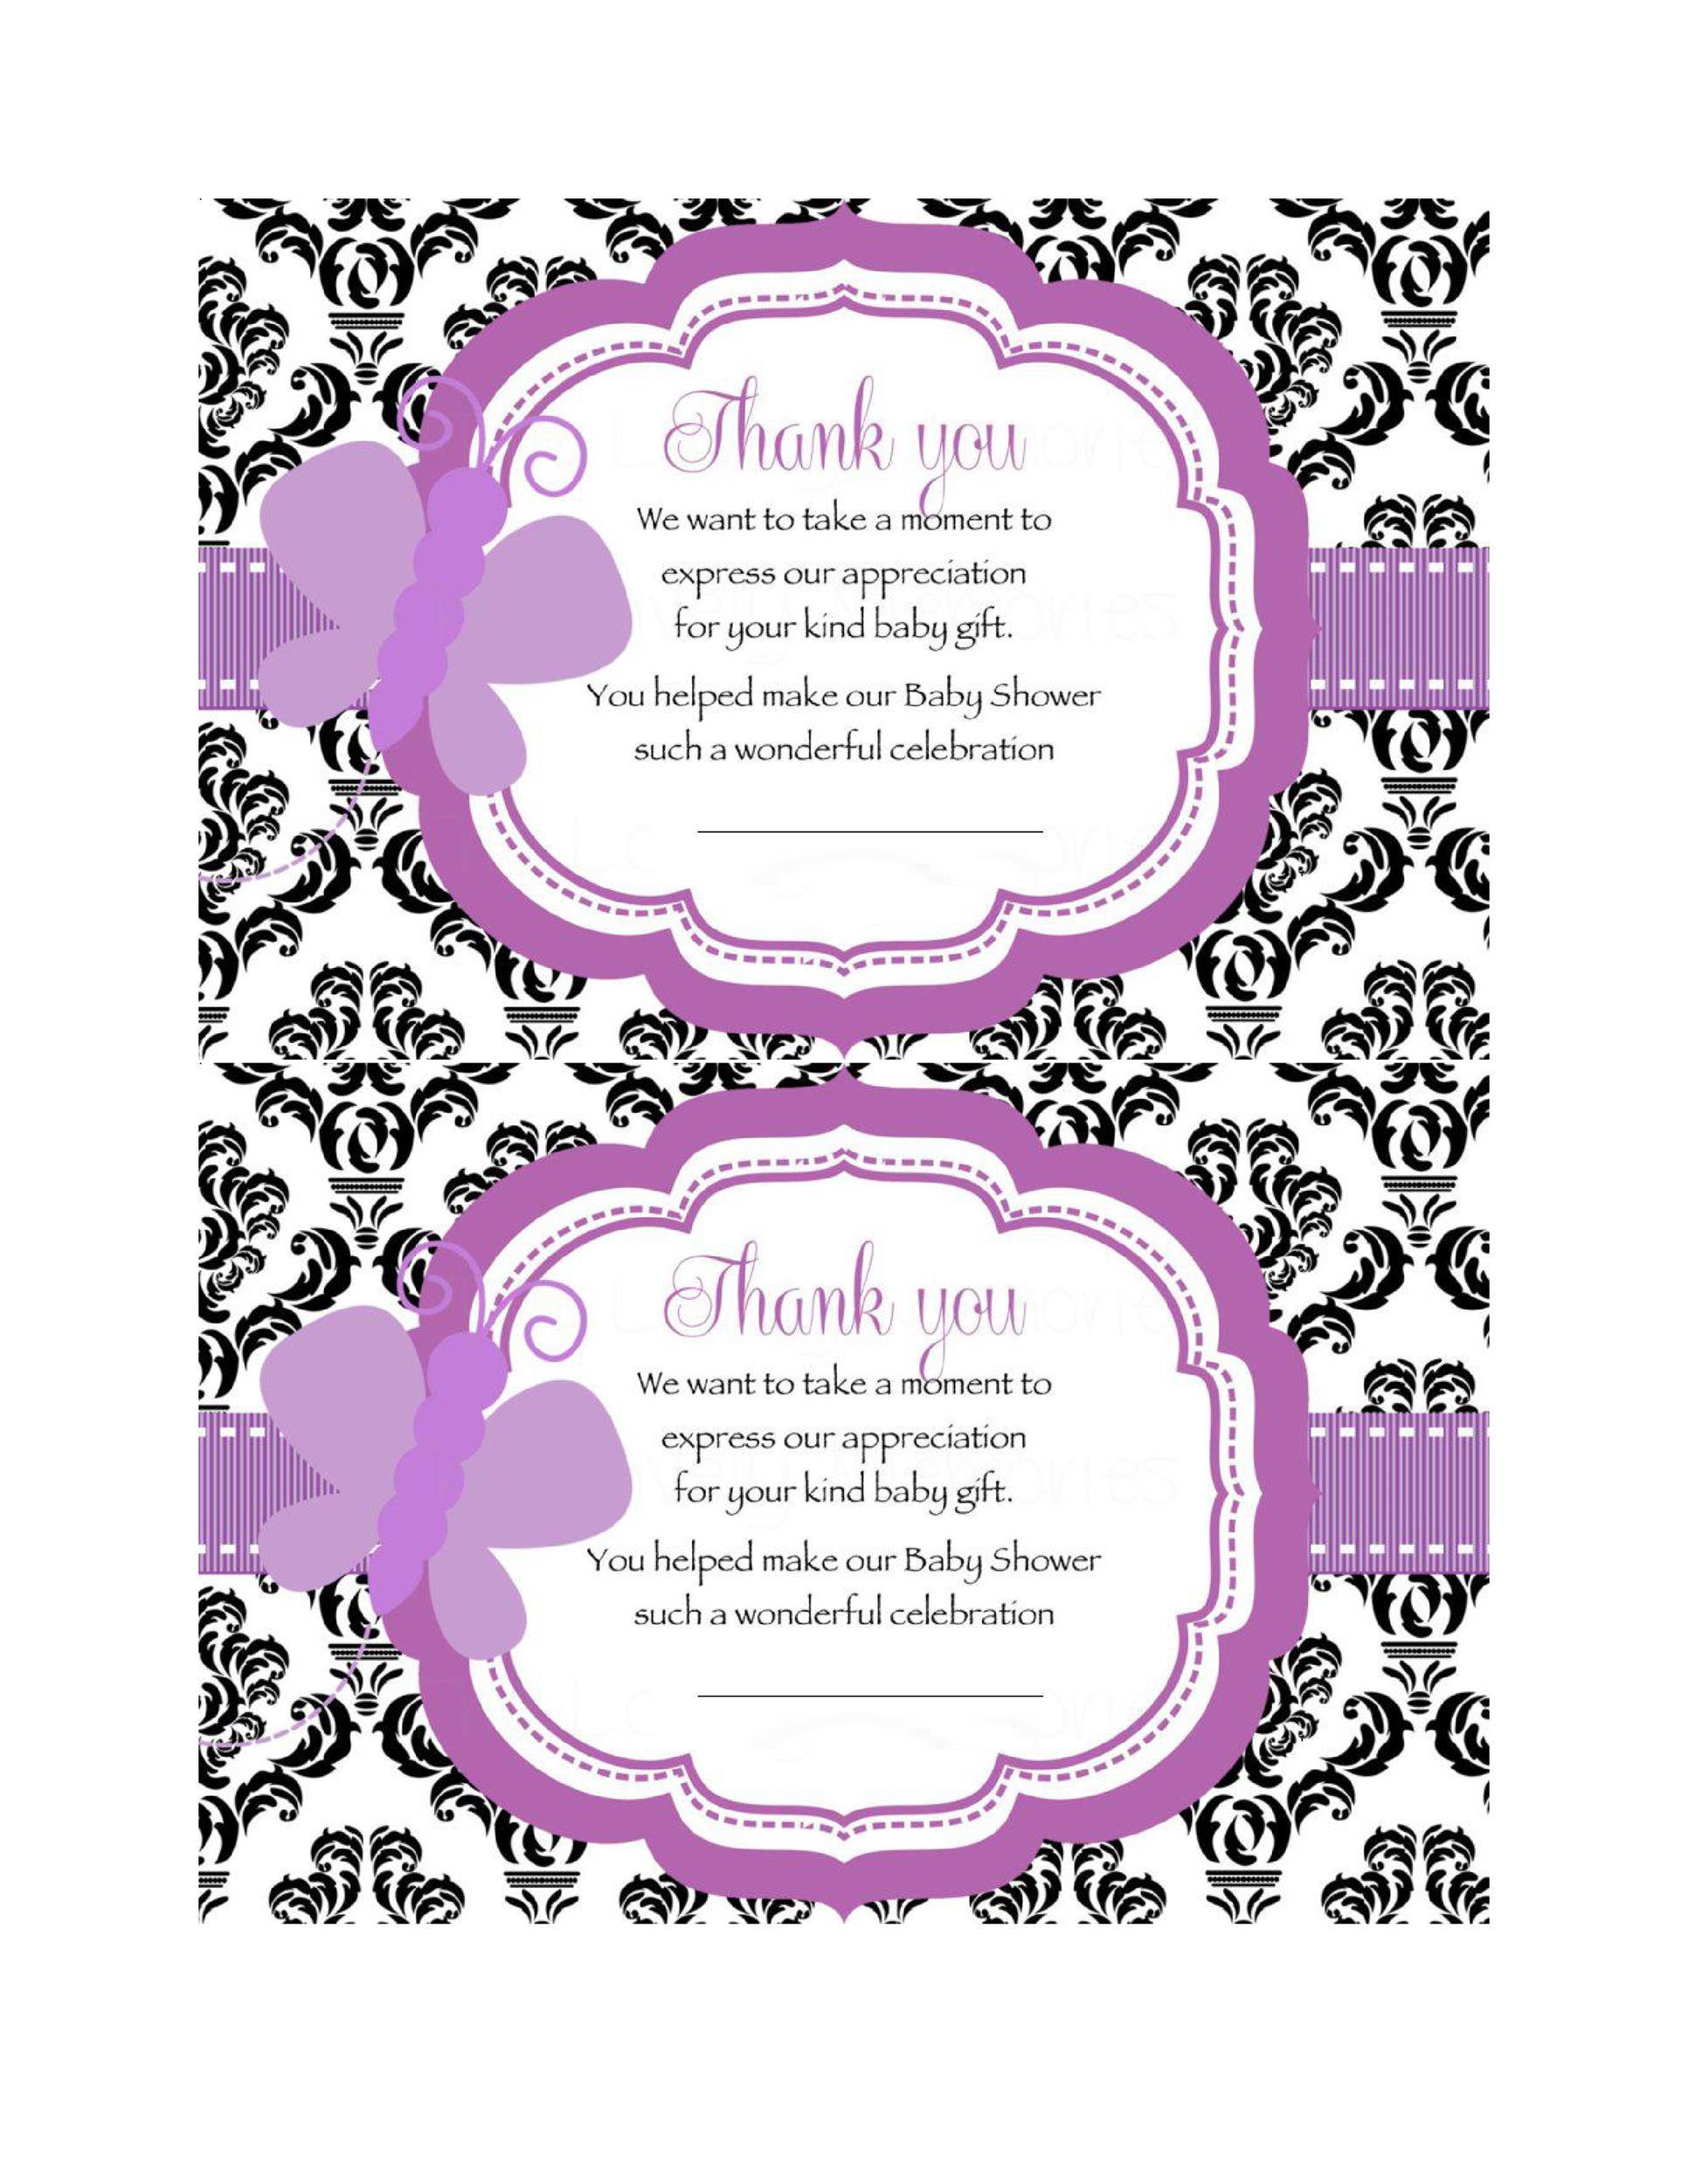 30+ Free Printable Thank You Card Templates (Wedding, Graduation